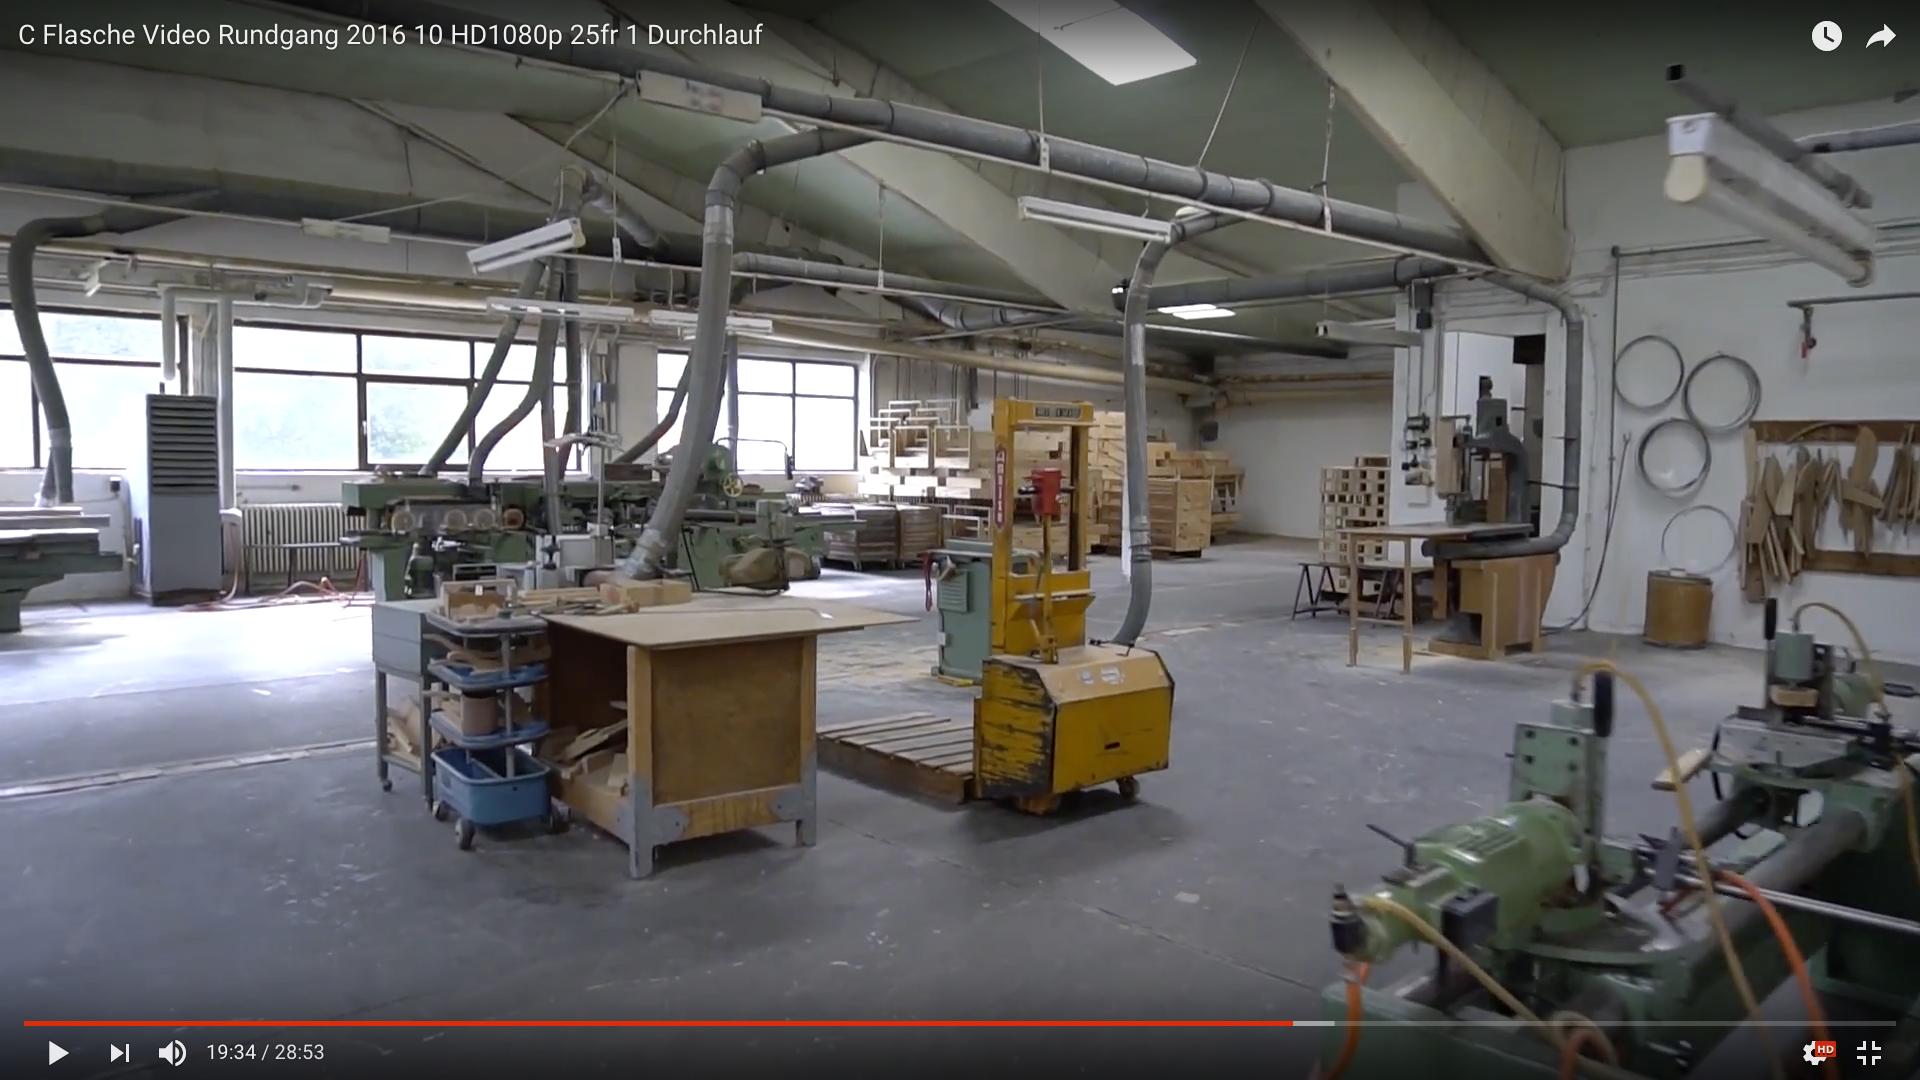 2017 C Flasche Video Rundgang Fabrik_MSM_MEDIEN_SAAR_MOSEL_SAARLAND_FERNSEHEN_1_ED_SAAR